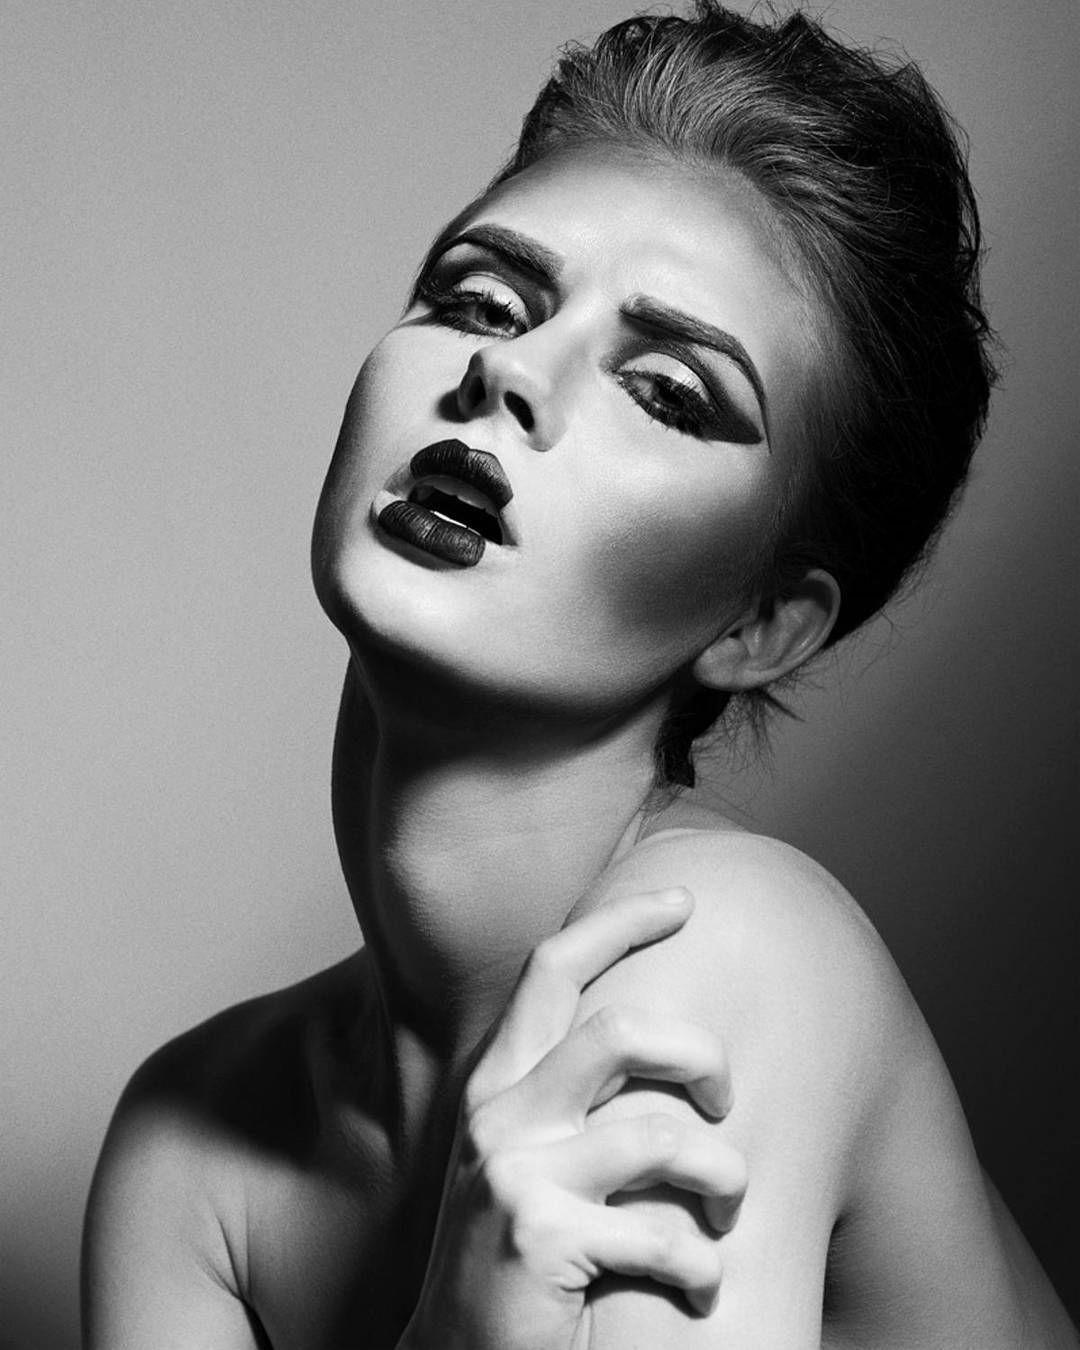 Follow hair and makeup artist laurenhoymua on talpool